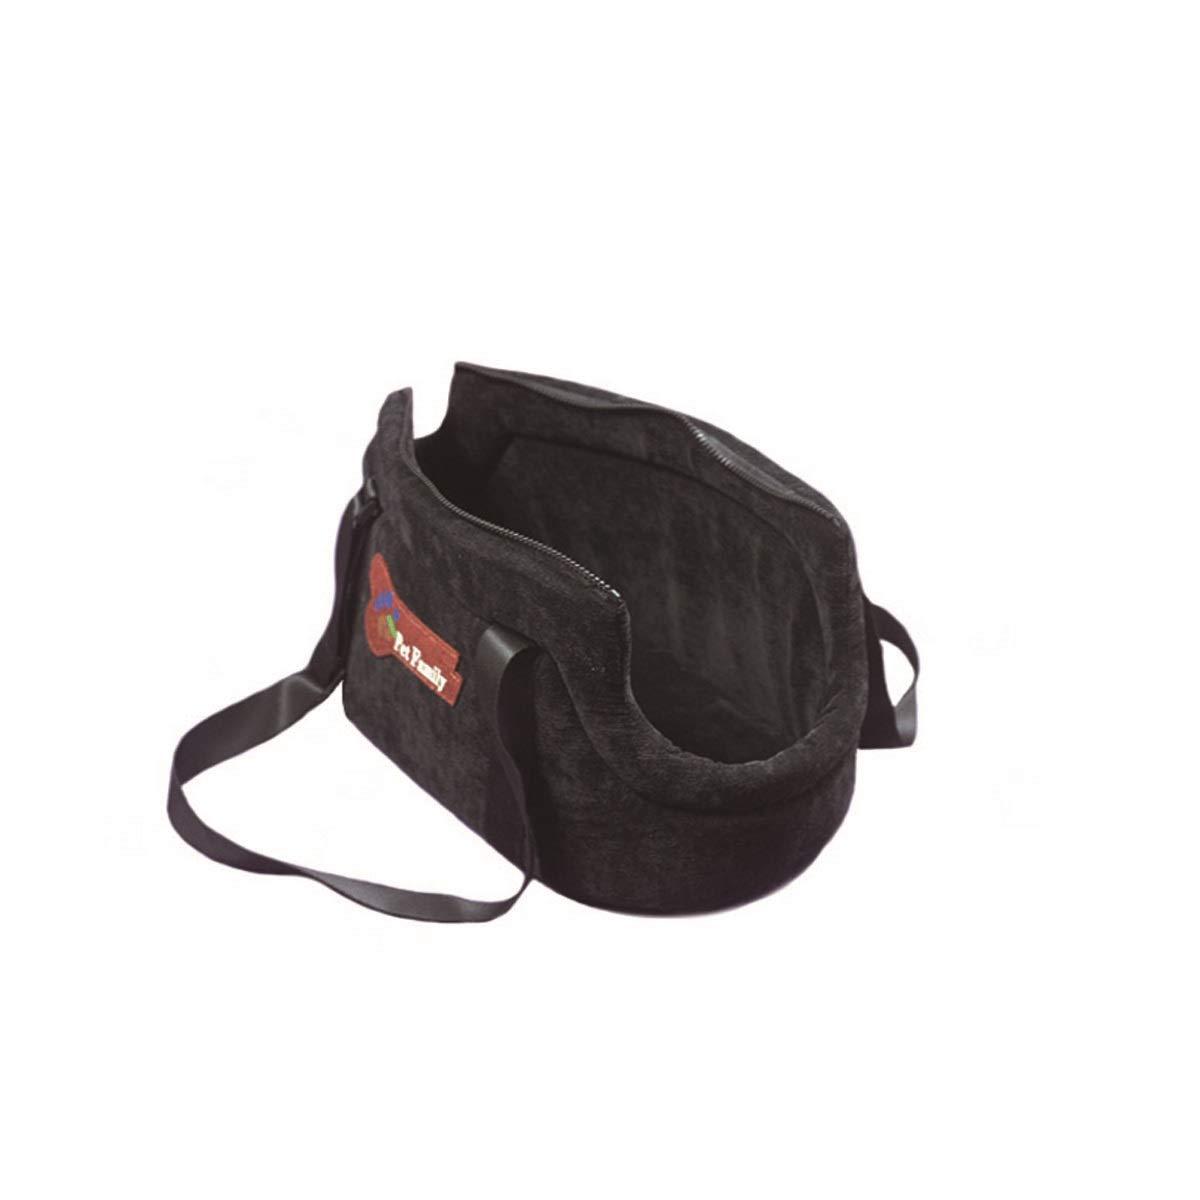 Black M Black M HENGTONGTONGXUN Pet Carrier, Cat Out Carrier, Carrying Bag, Red, Black, bluee, Light bluee, Green Bite resistant, wear resistant, washable (color   Black, Size   M)